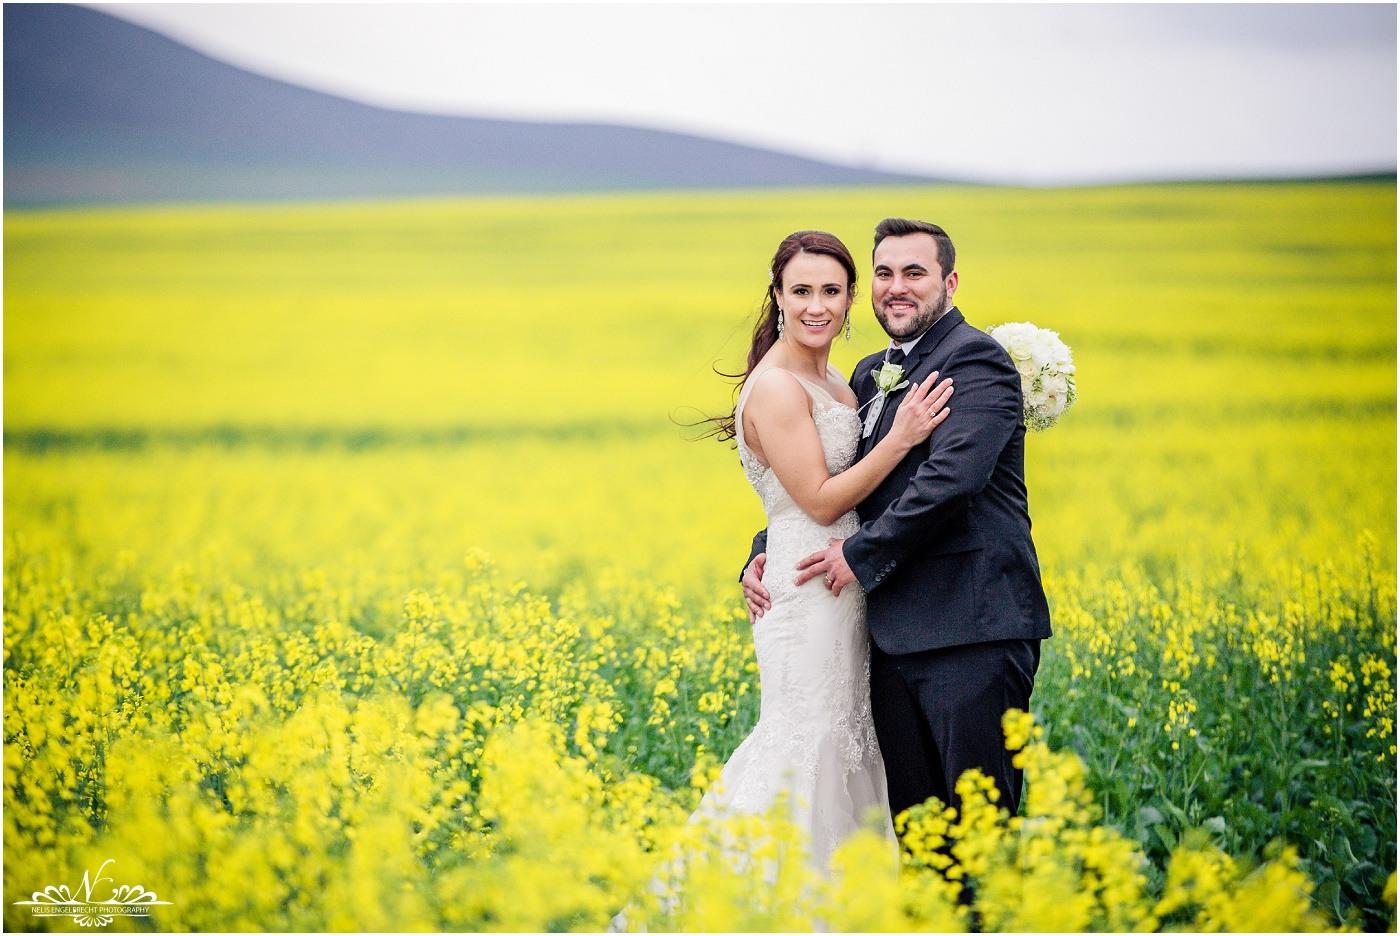 Eensgezind-Wedding-Photos-Nelis-Engelbrecht-Photography-138